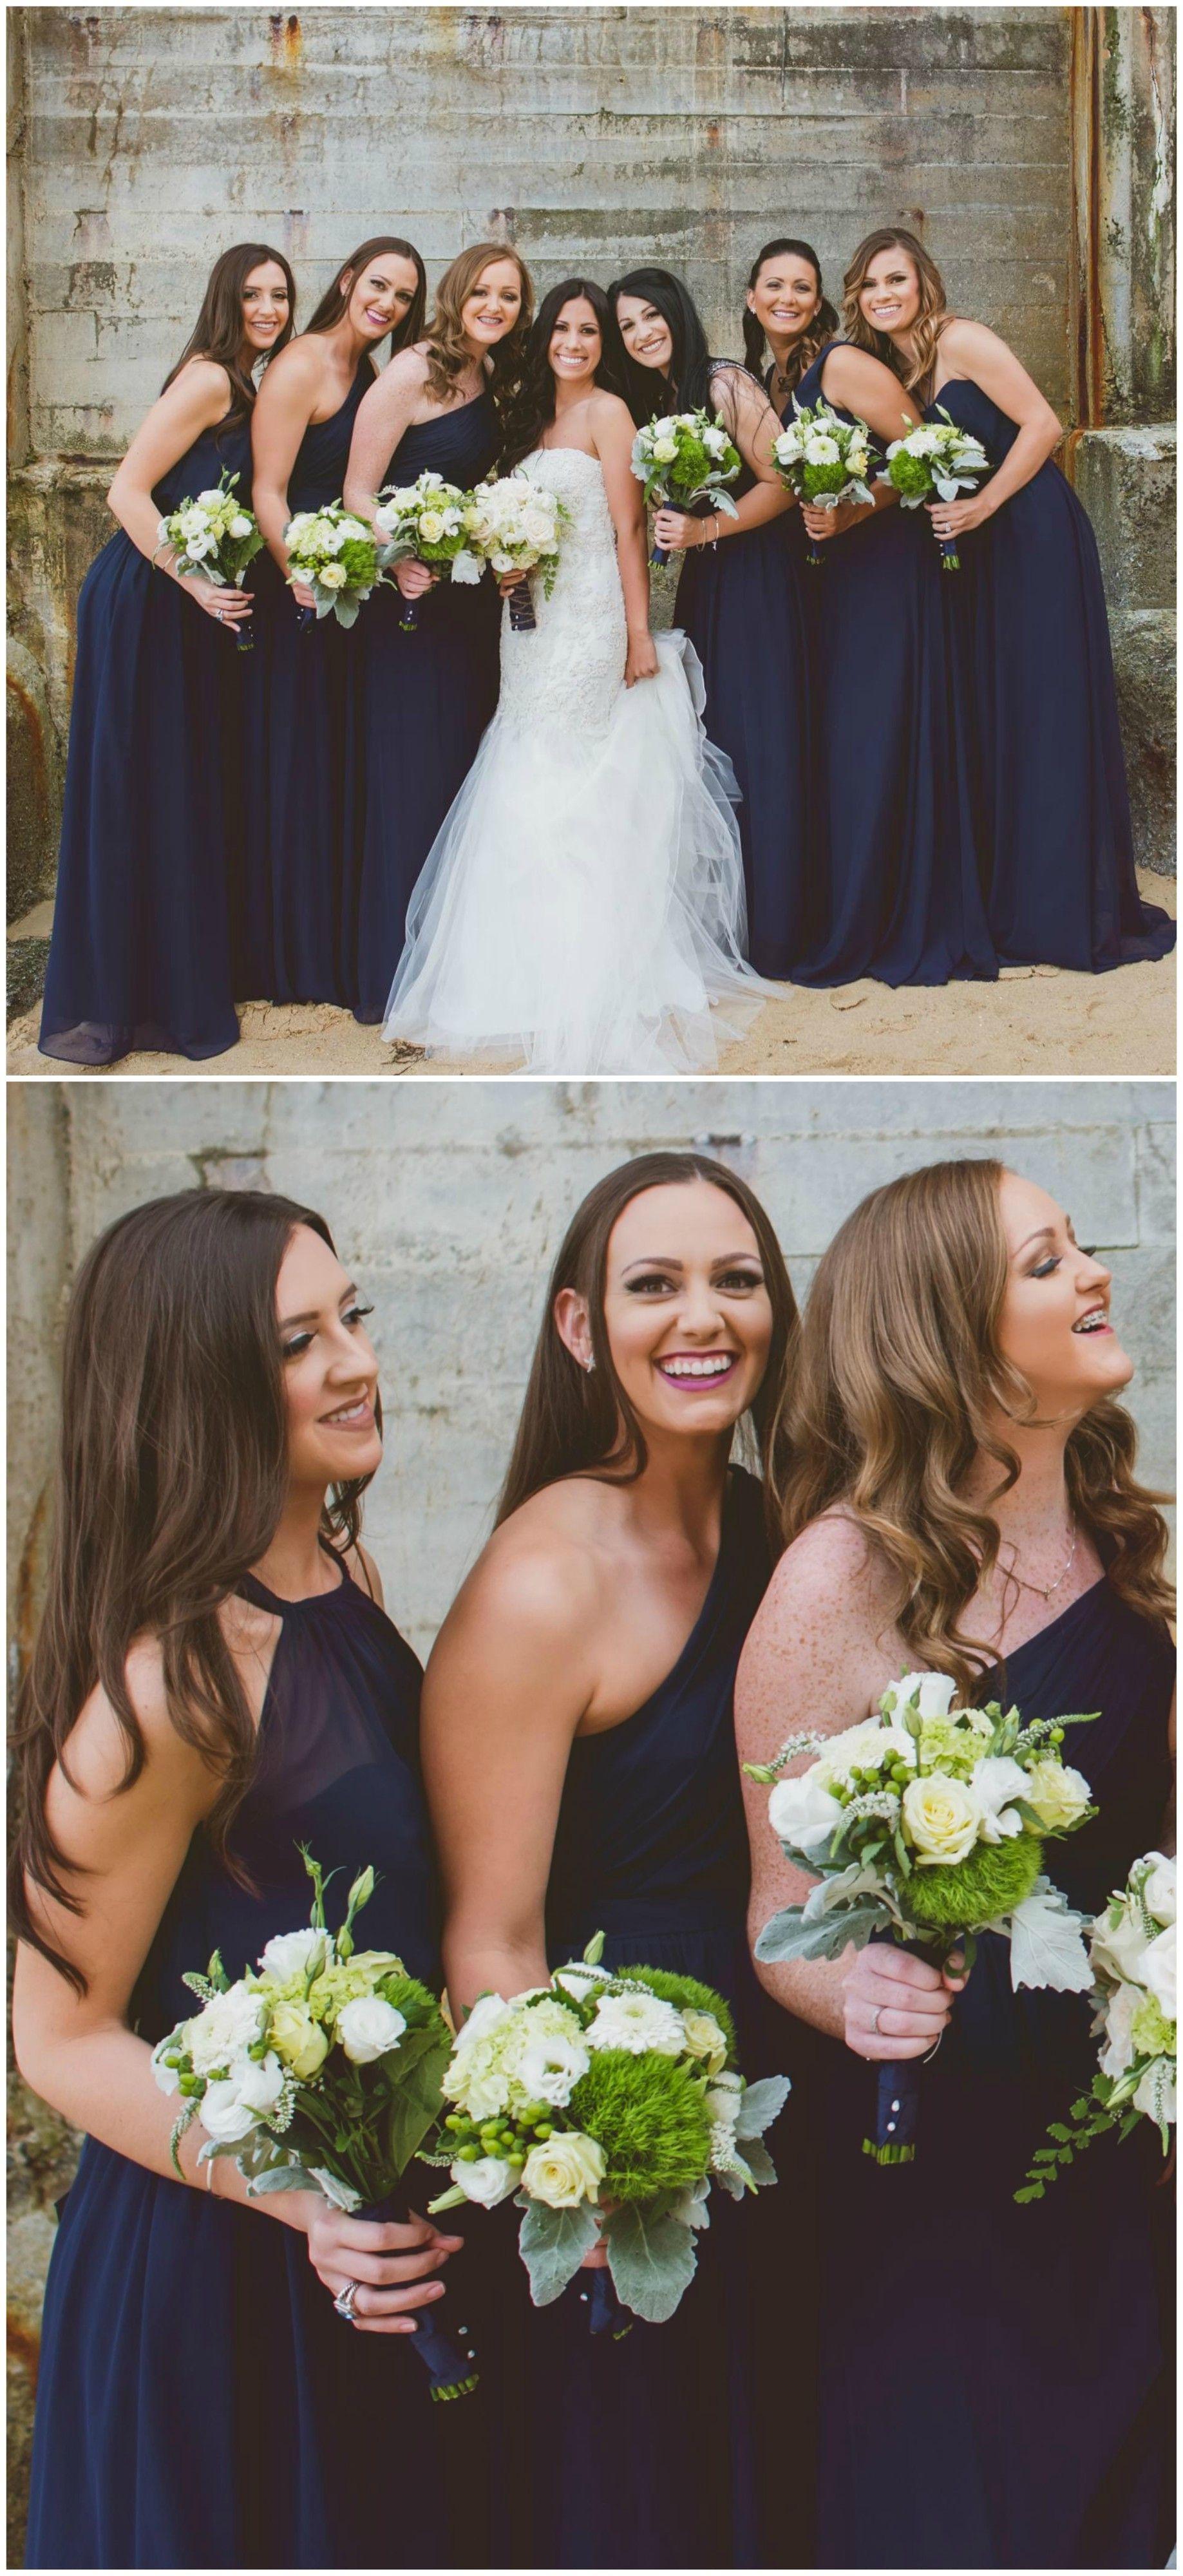 Navy Blue Bridesmaid Dresses Elegant Gowns California Bridal Party White And Lim Brides Maid Green Cranberry Bridesmaid Dresses Navy Blue Bridesmaid Dresses [ 4000 x 1837 Pixel ]